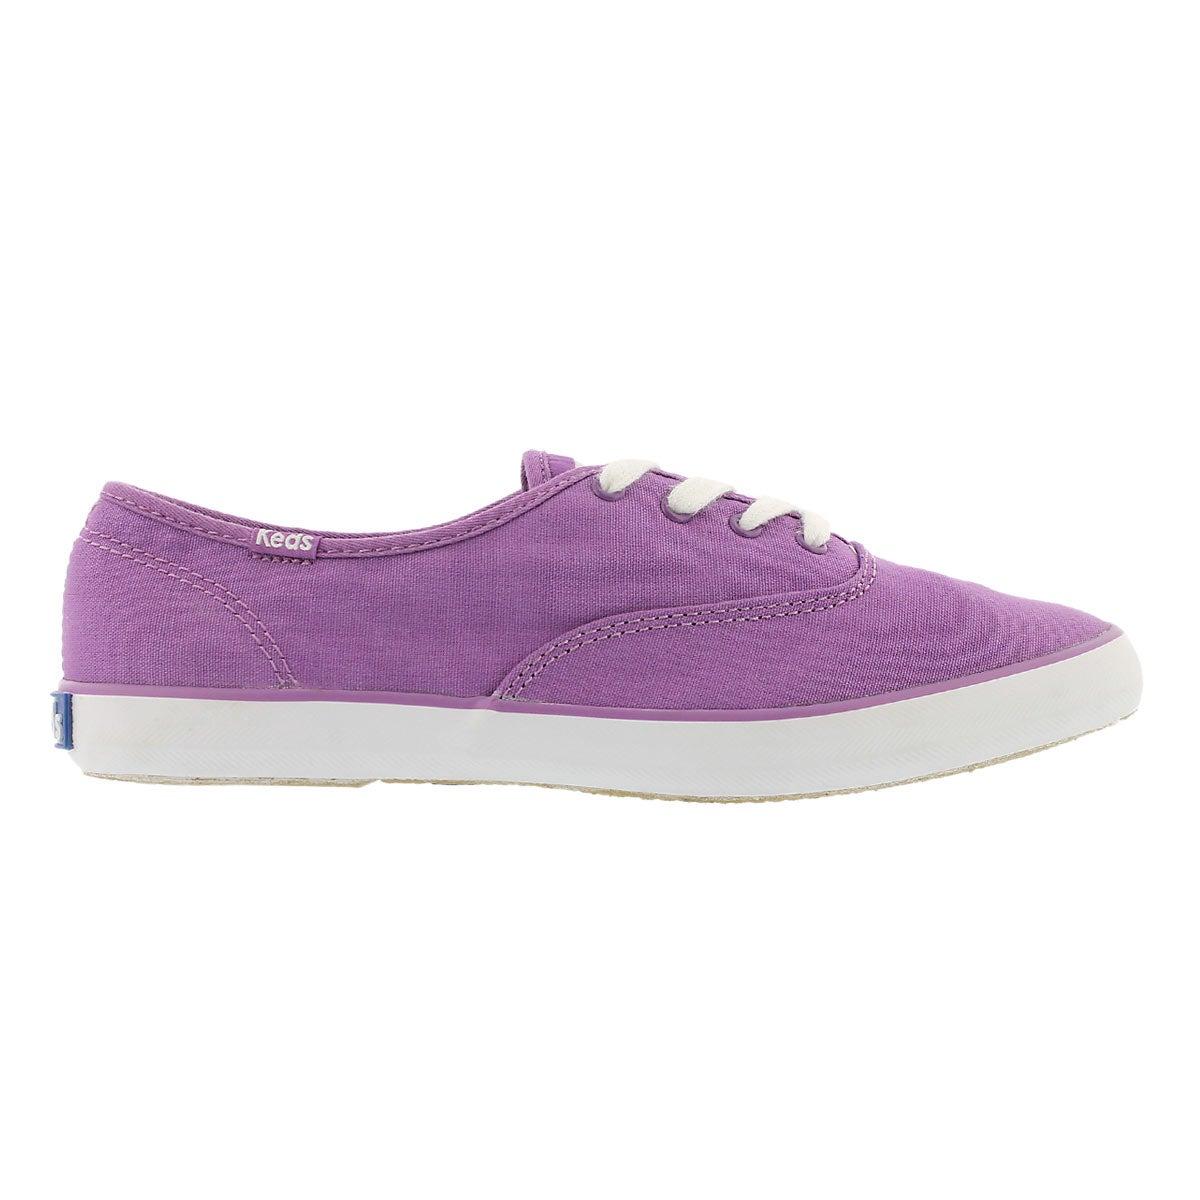 Espadrilles Champion toile violette, fem